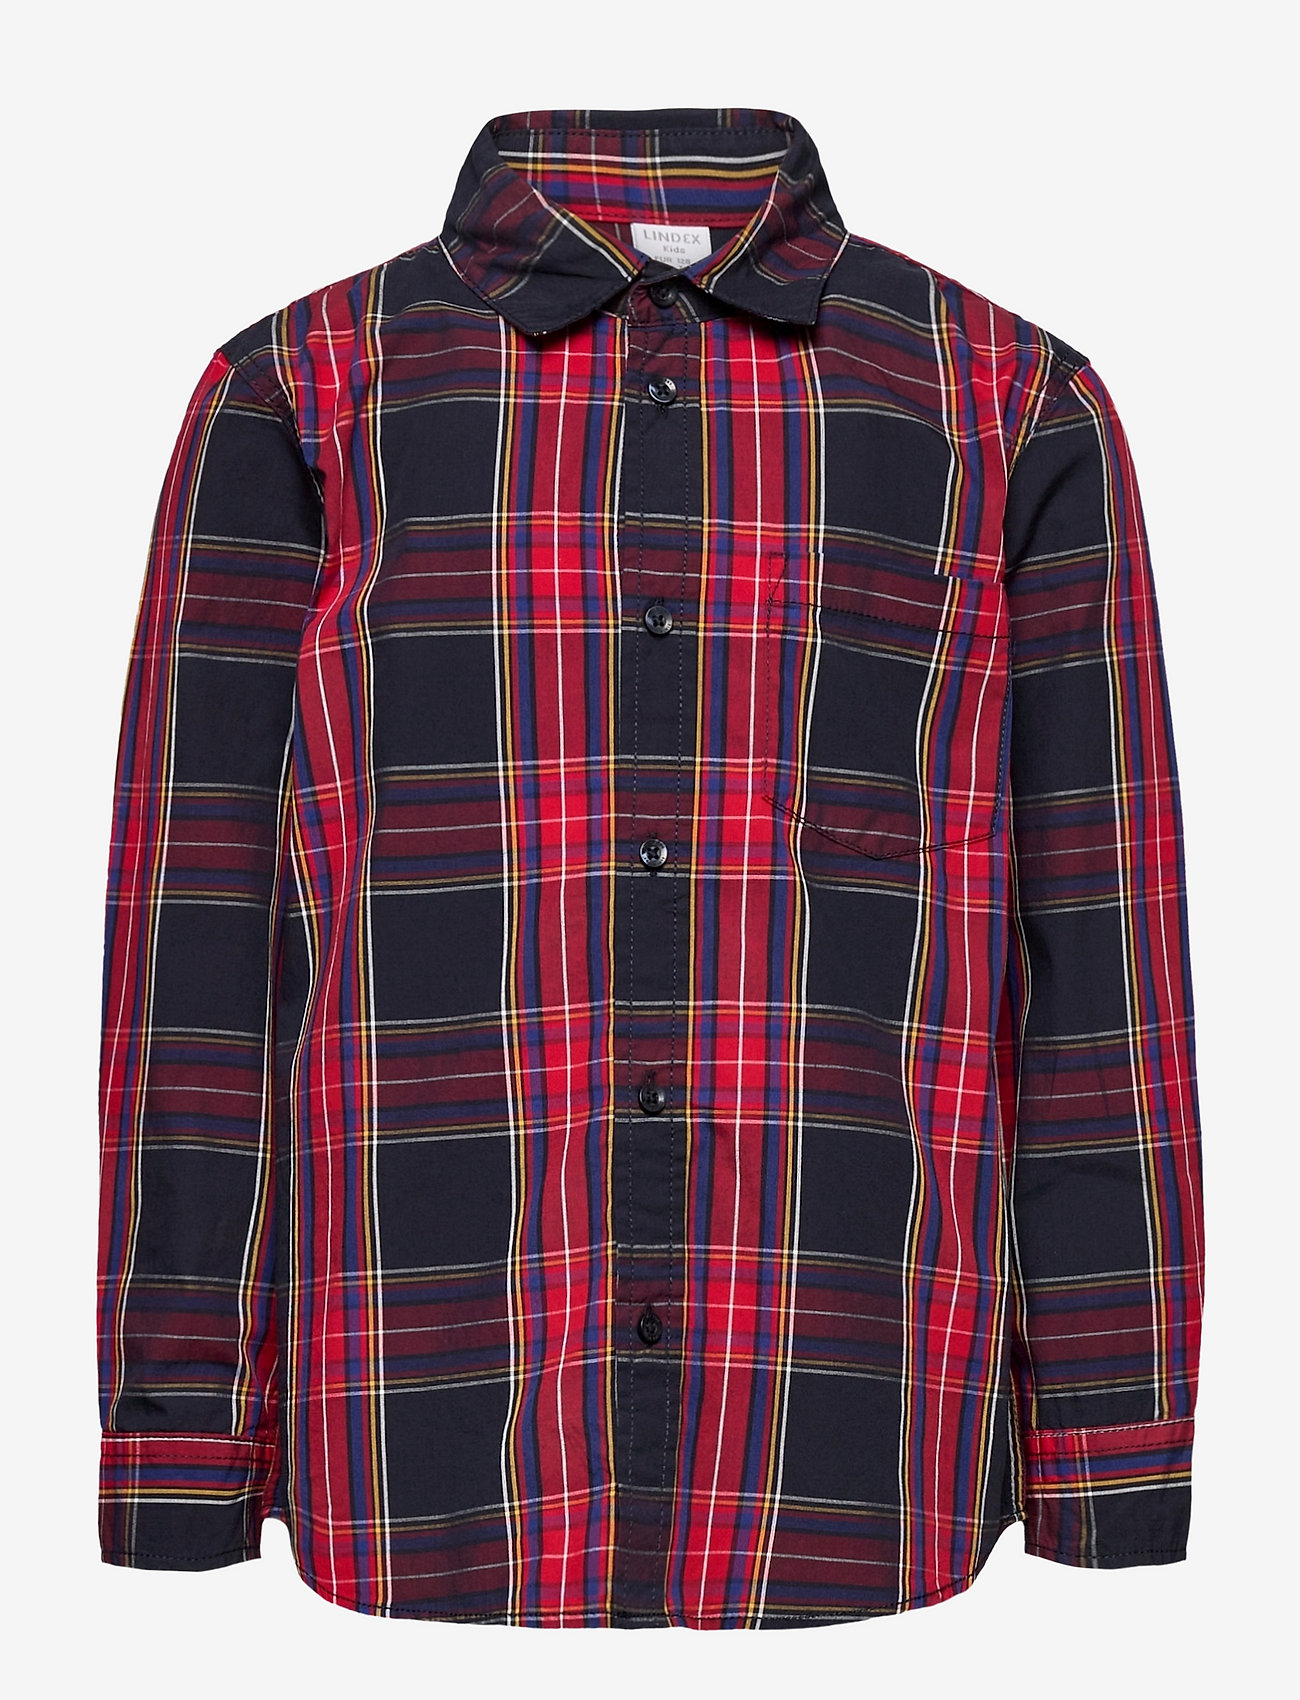 Lindex - Shirt check party checks - overhemden - dark navy - 0